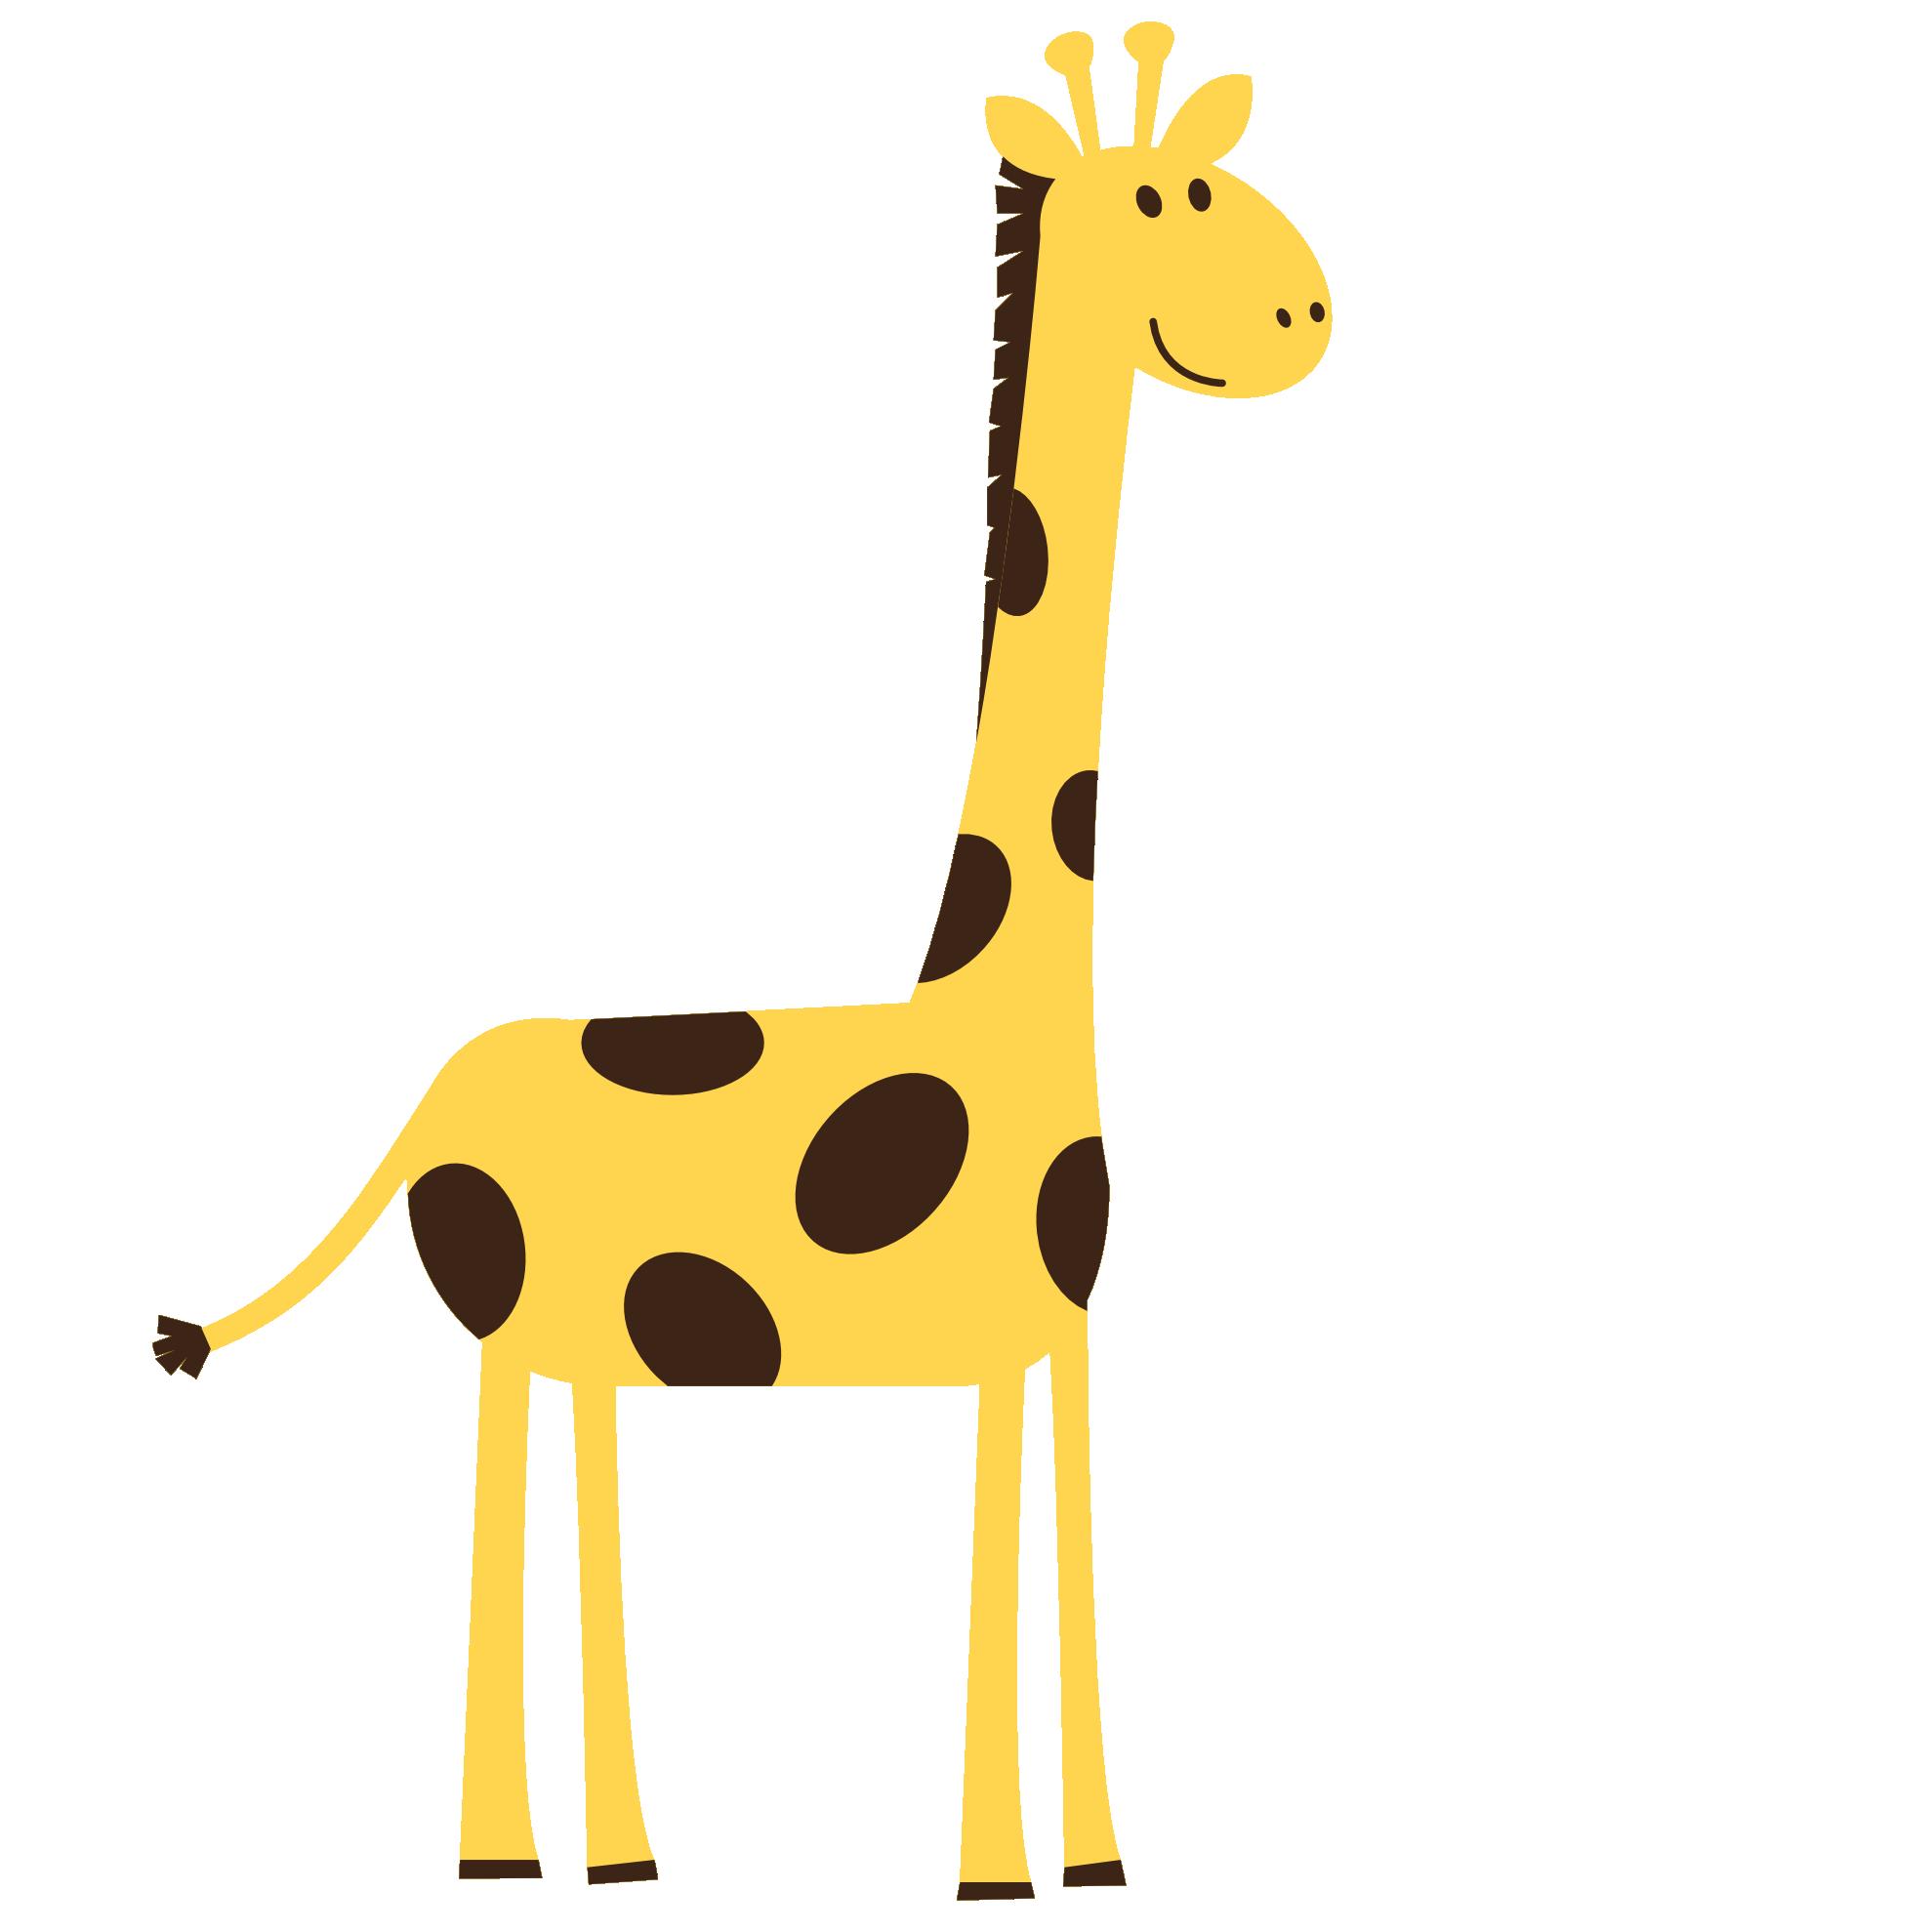 giraffe clip art clipart panda free clipart images rh clipartpanda com free giraffe cartoon clipart free giraffe clip art